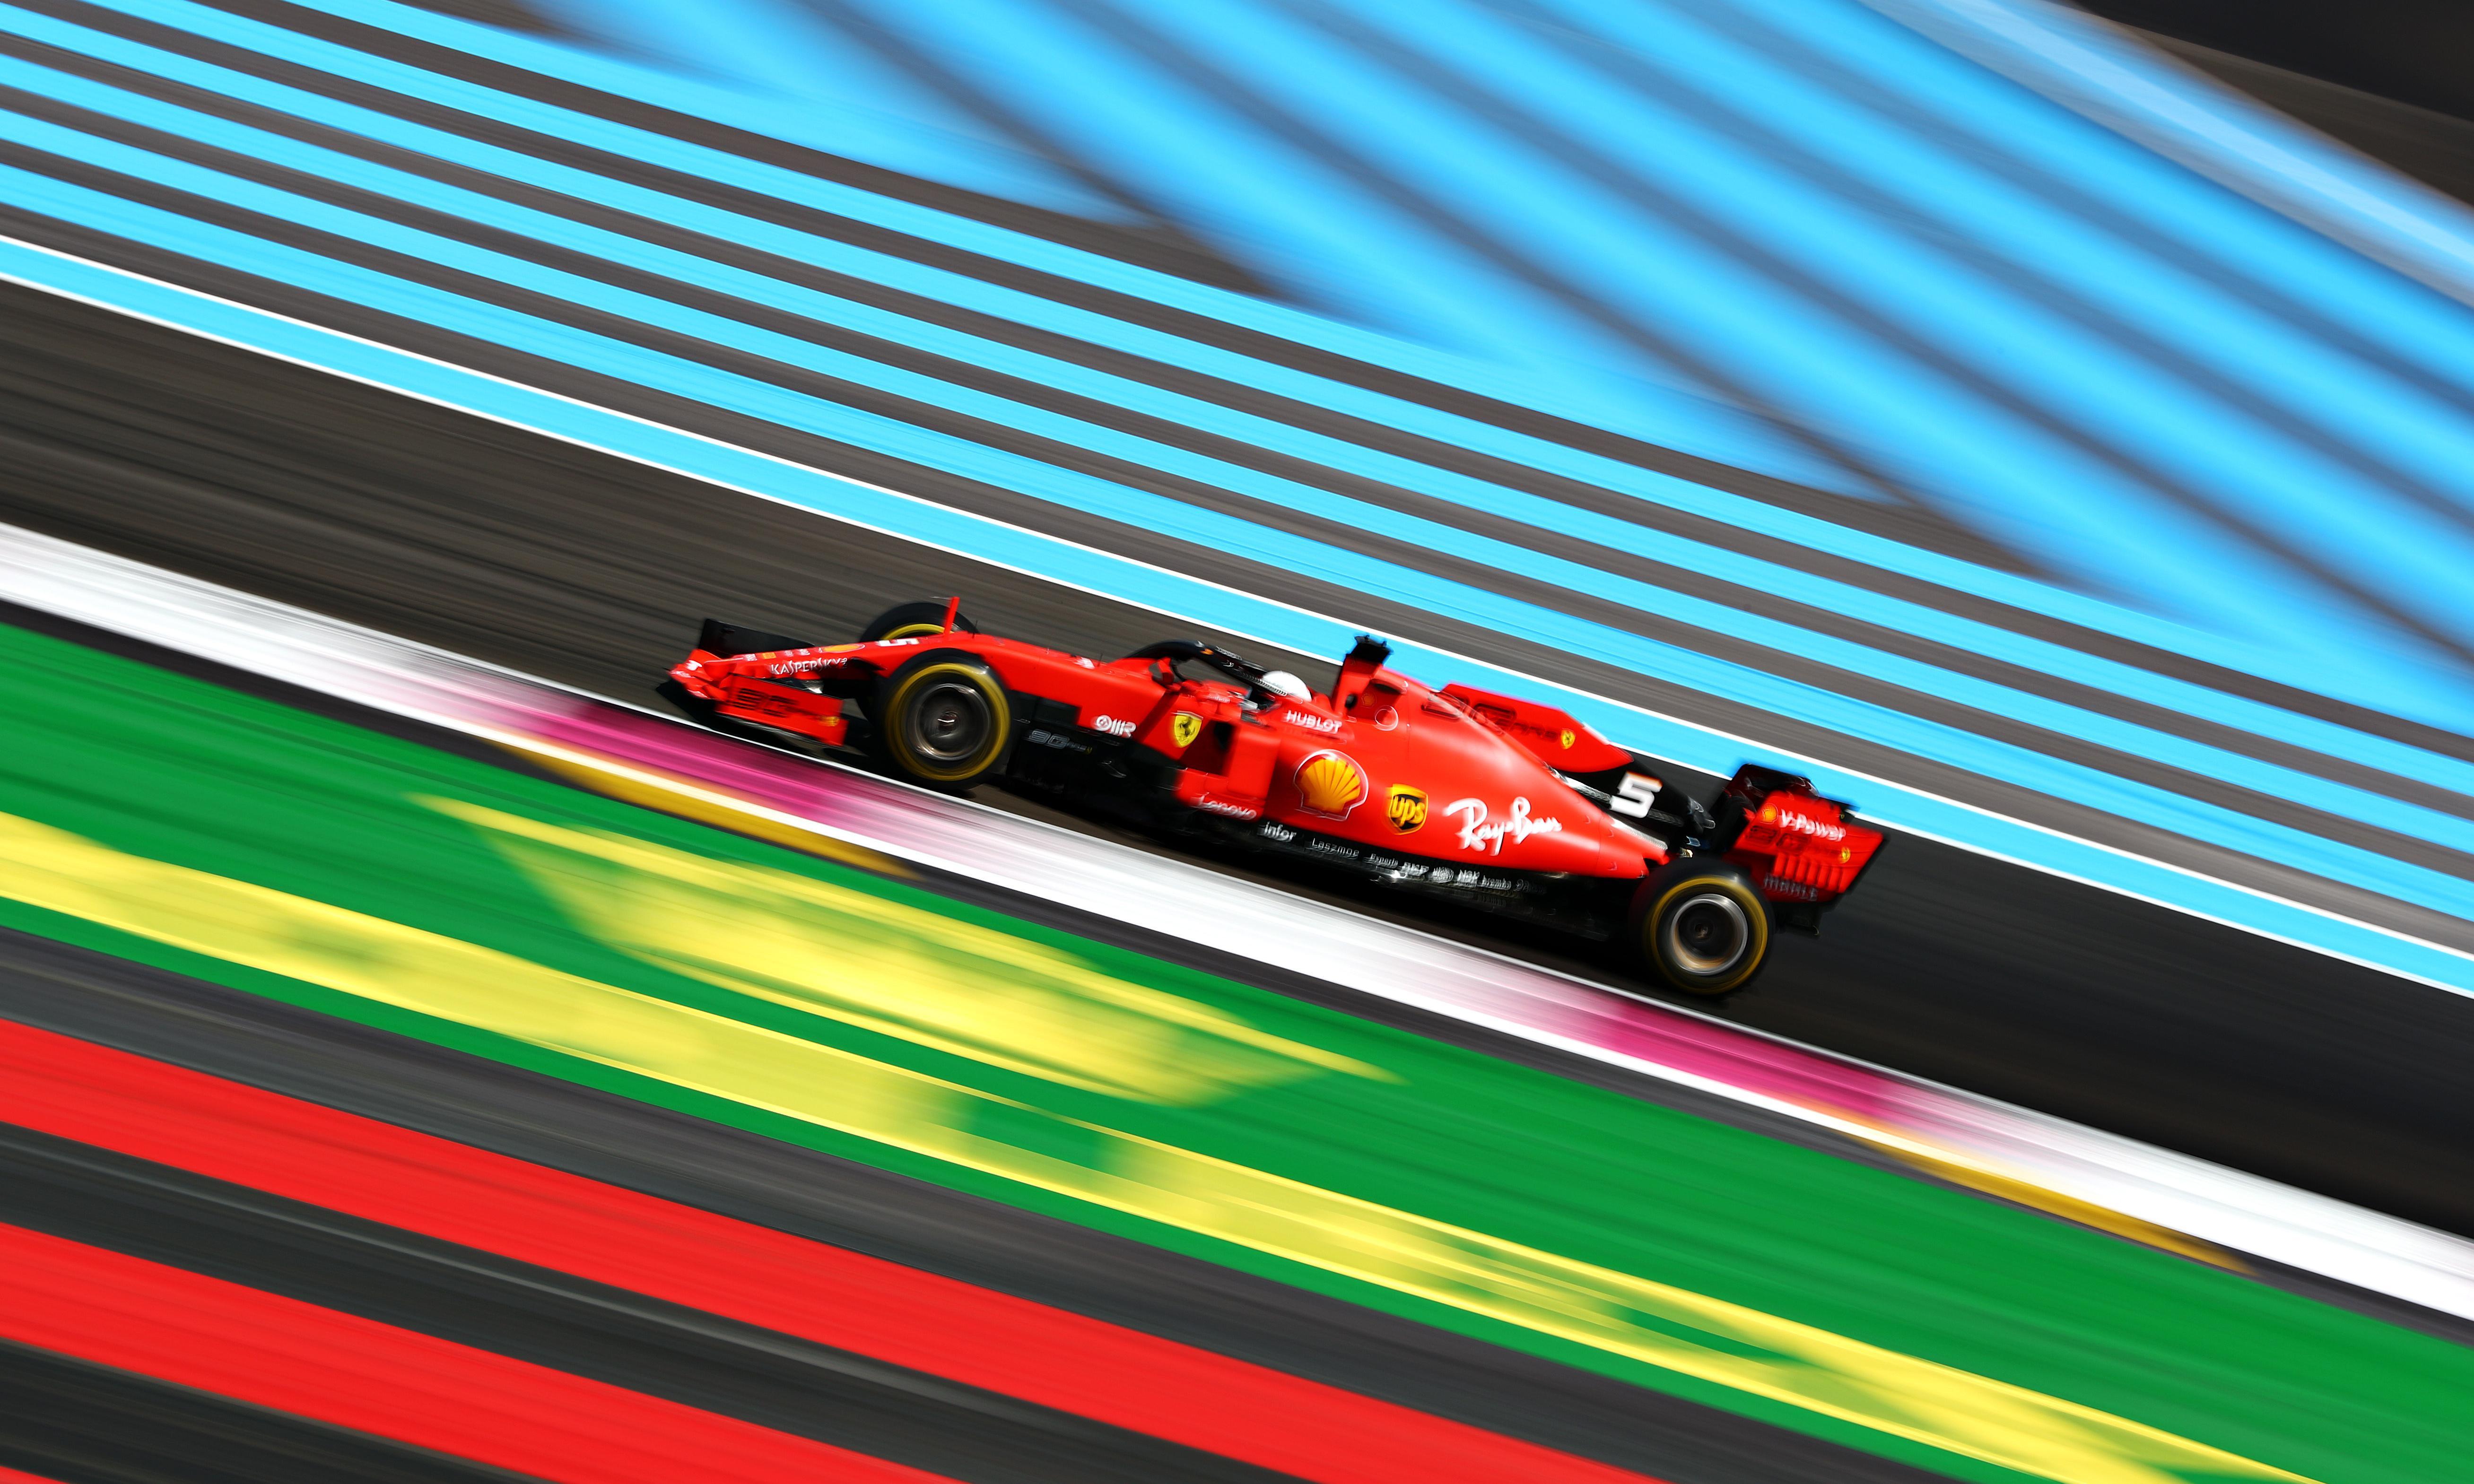 Dominant Lewis Hamilton wins the French Grand Prix as Vettel slips back